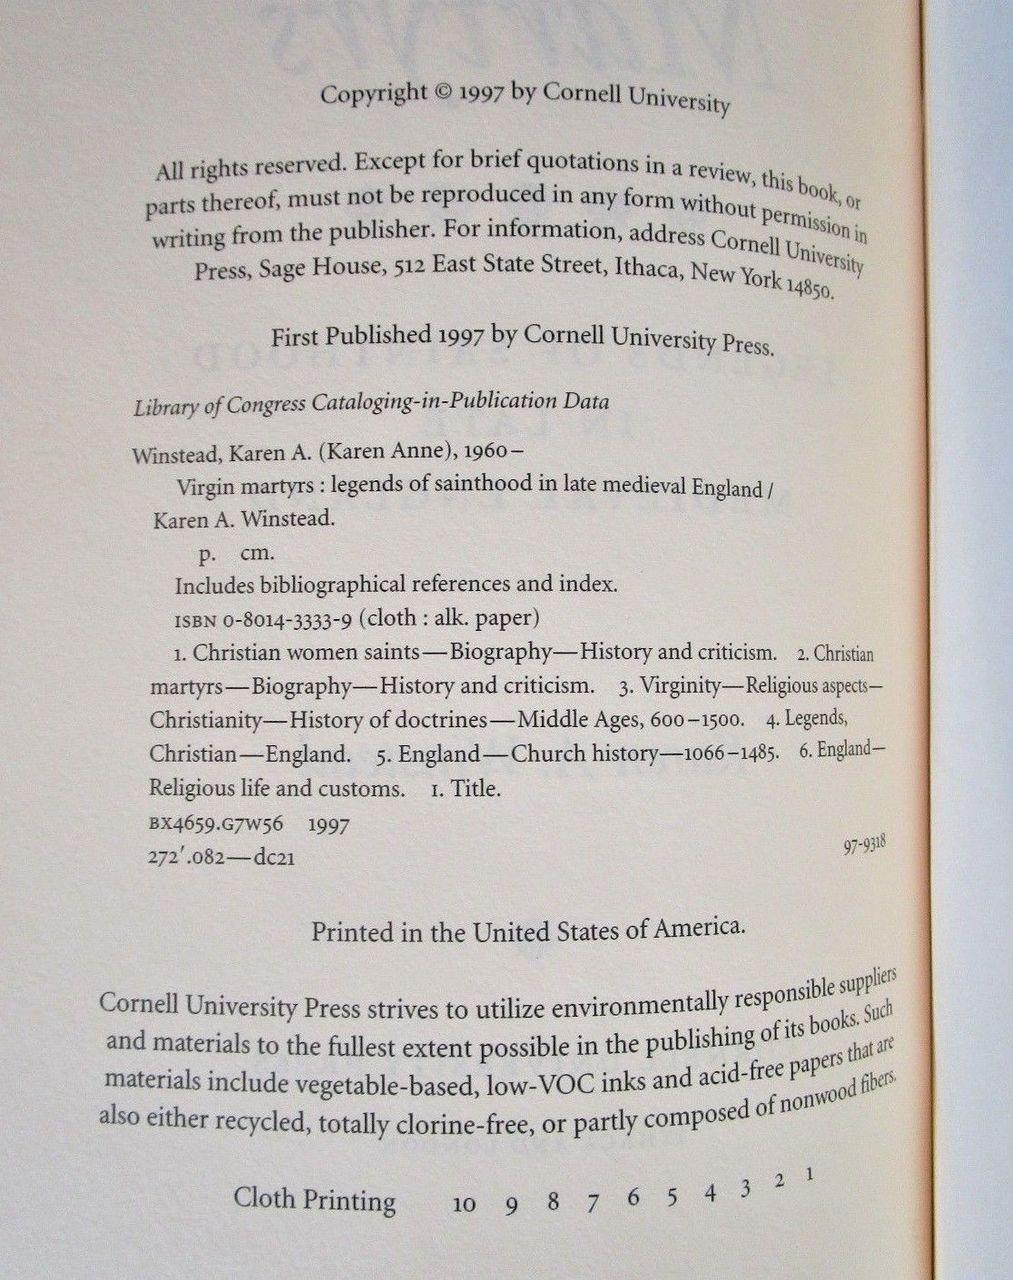 VIRGIN MARTYRS: LEGENDS OF SAINTHOOD IN LATE MEDIEVAL ENGLAND, Karen A. Winstead - 1997 [1st Ed]